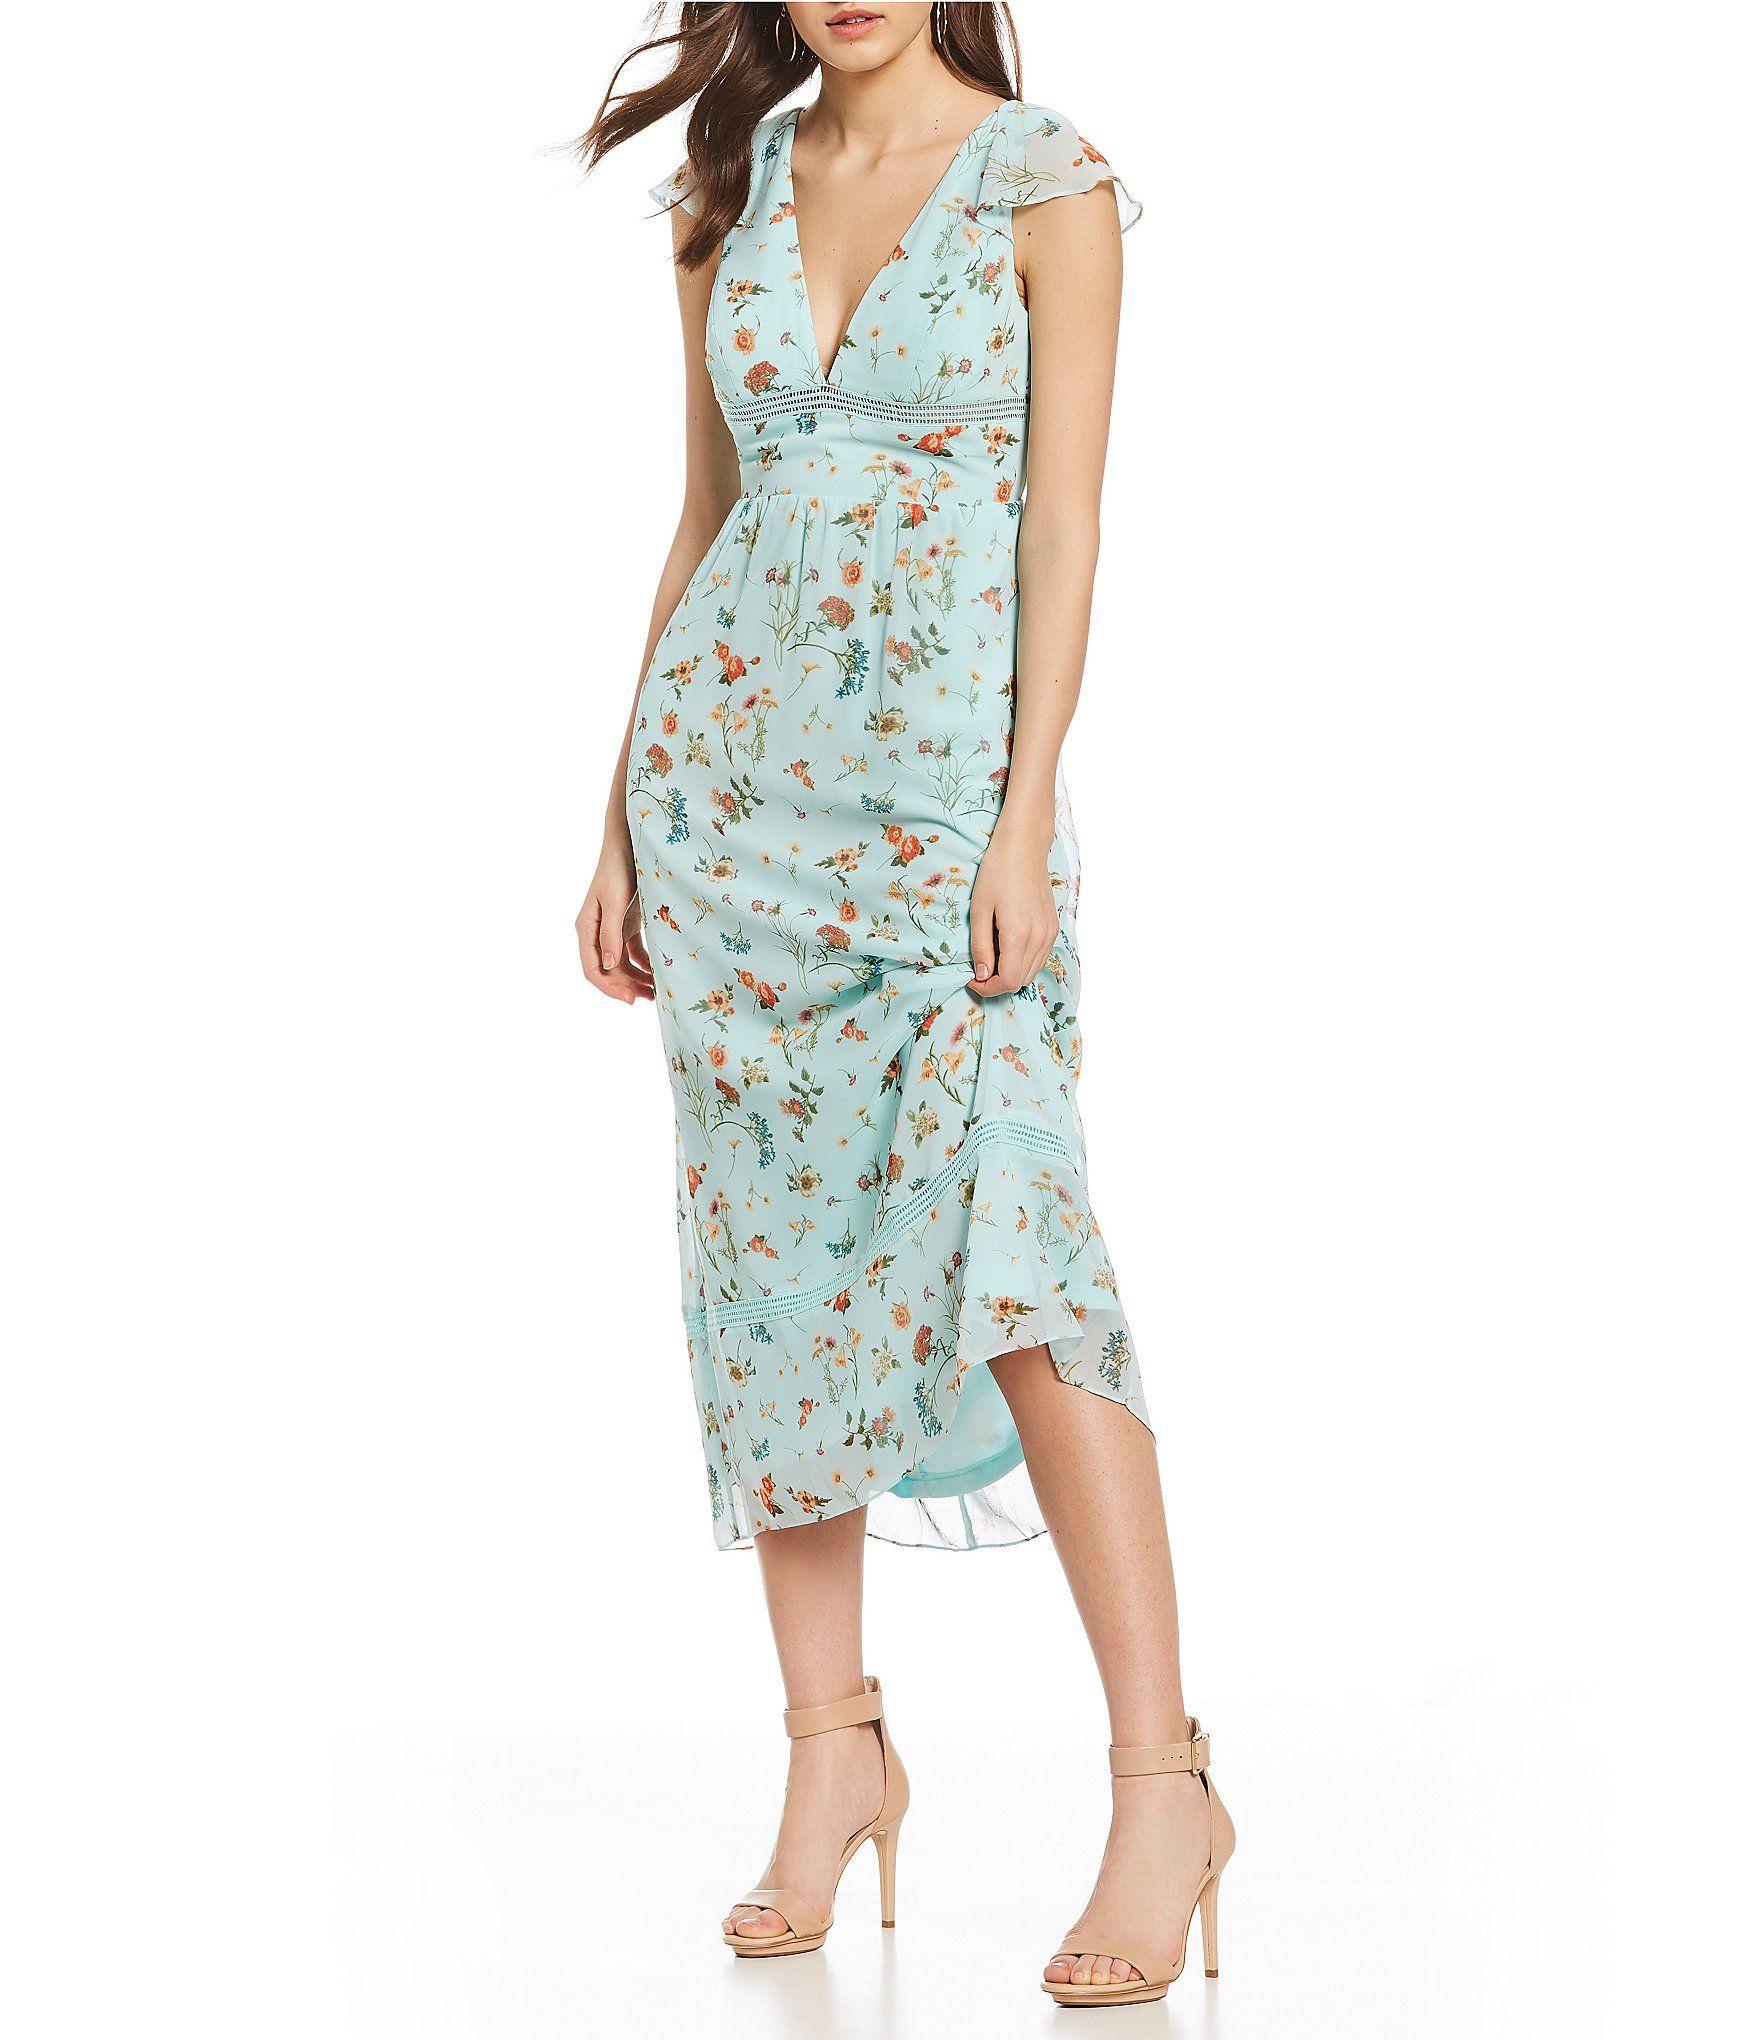 69a90bab741 Gianni Bini Stella Ditsy Floral Print Prairie Midi Dress in 2018 ...